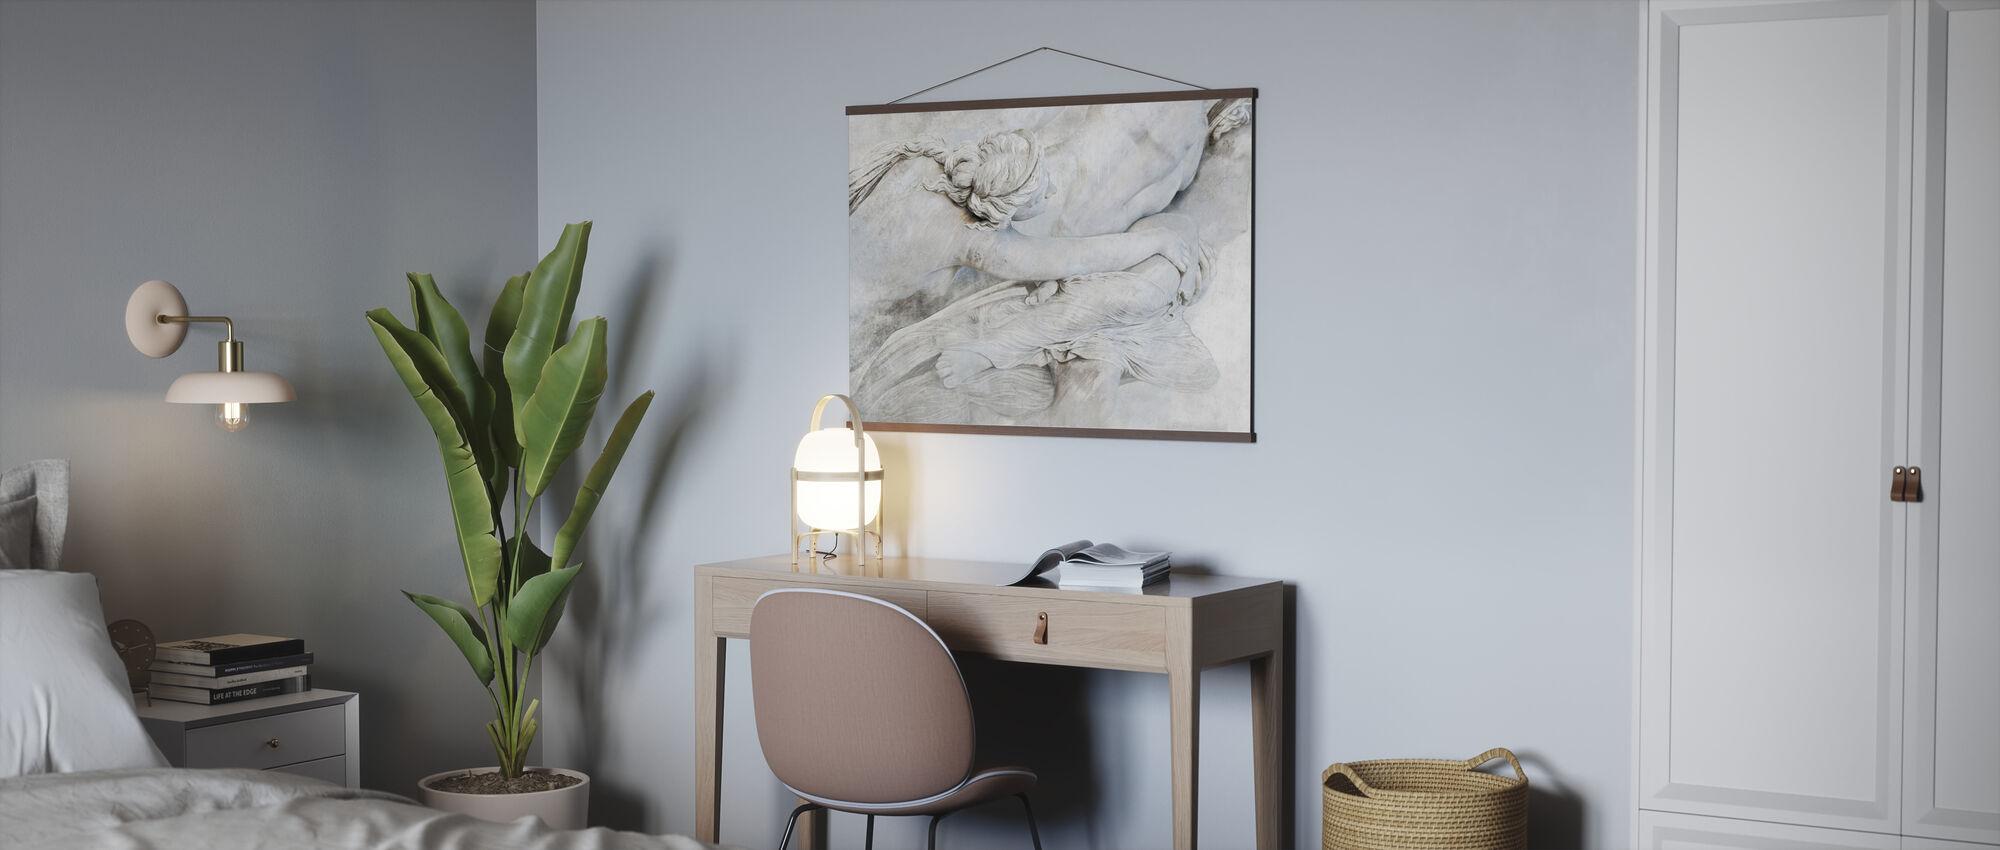 Sculpture - Poster - Office